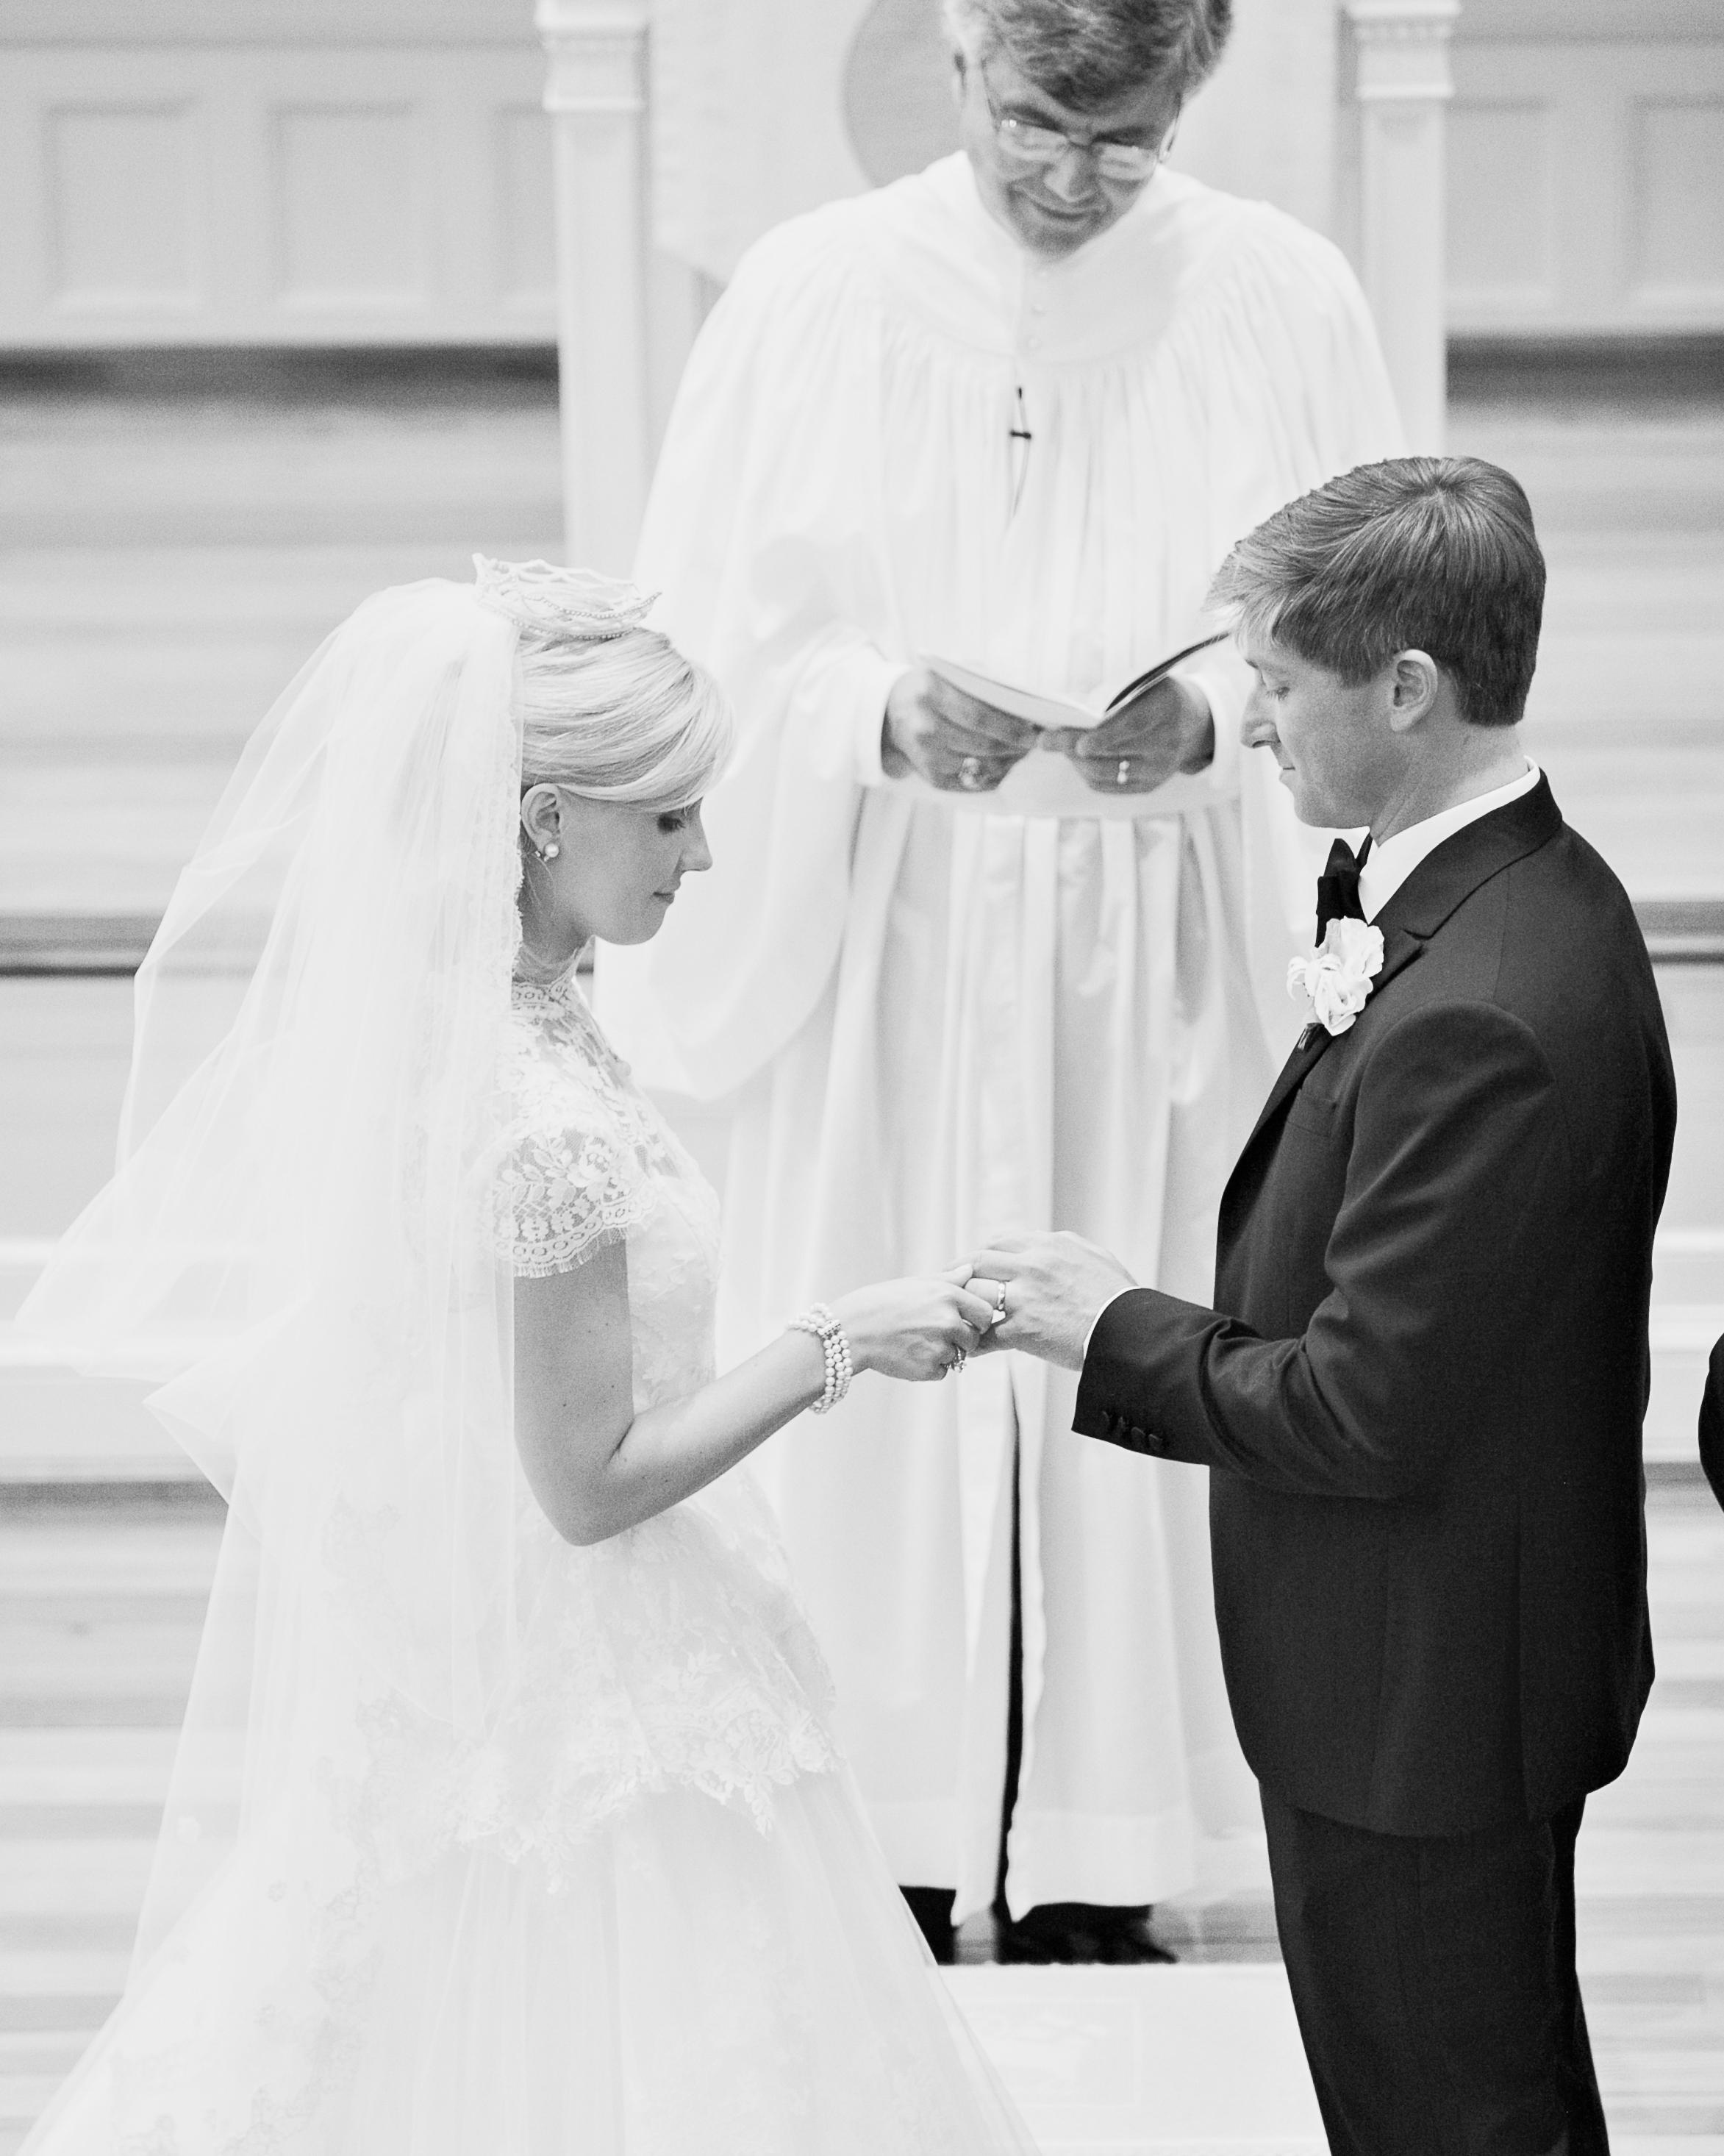 molly-patrick-wedding-ceremony-3493-s111760-0115.jpg